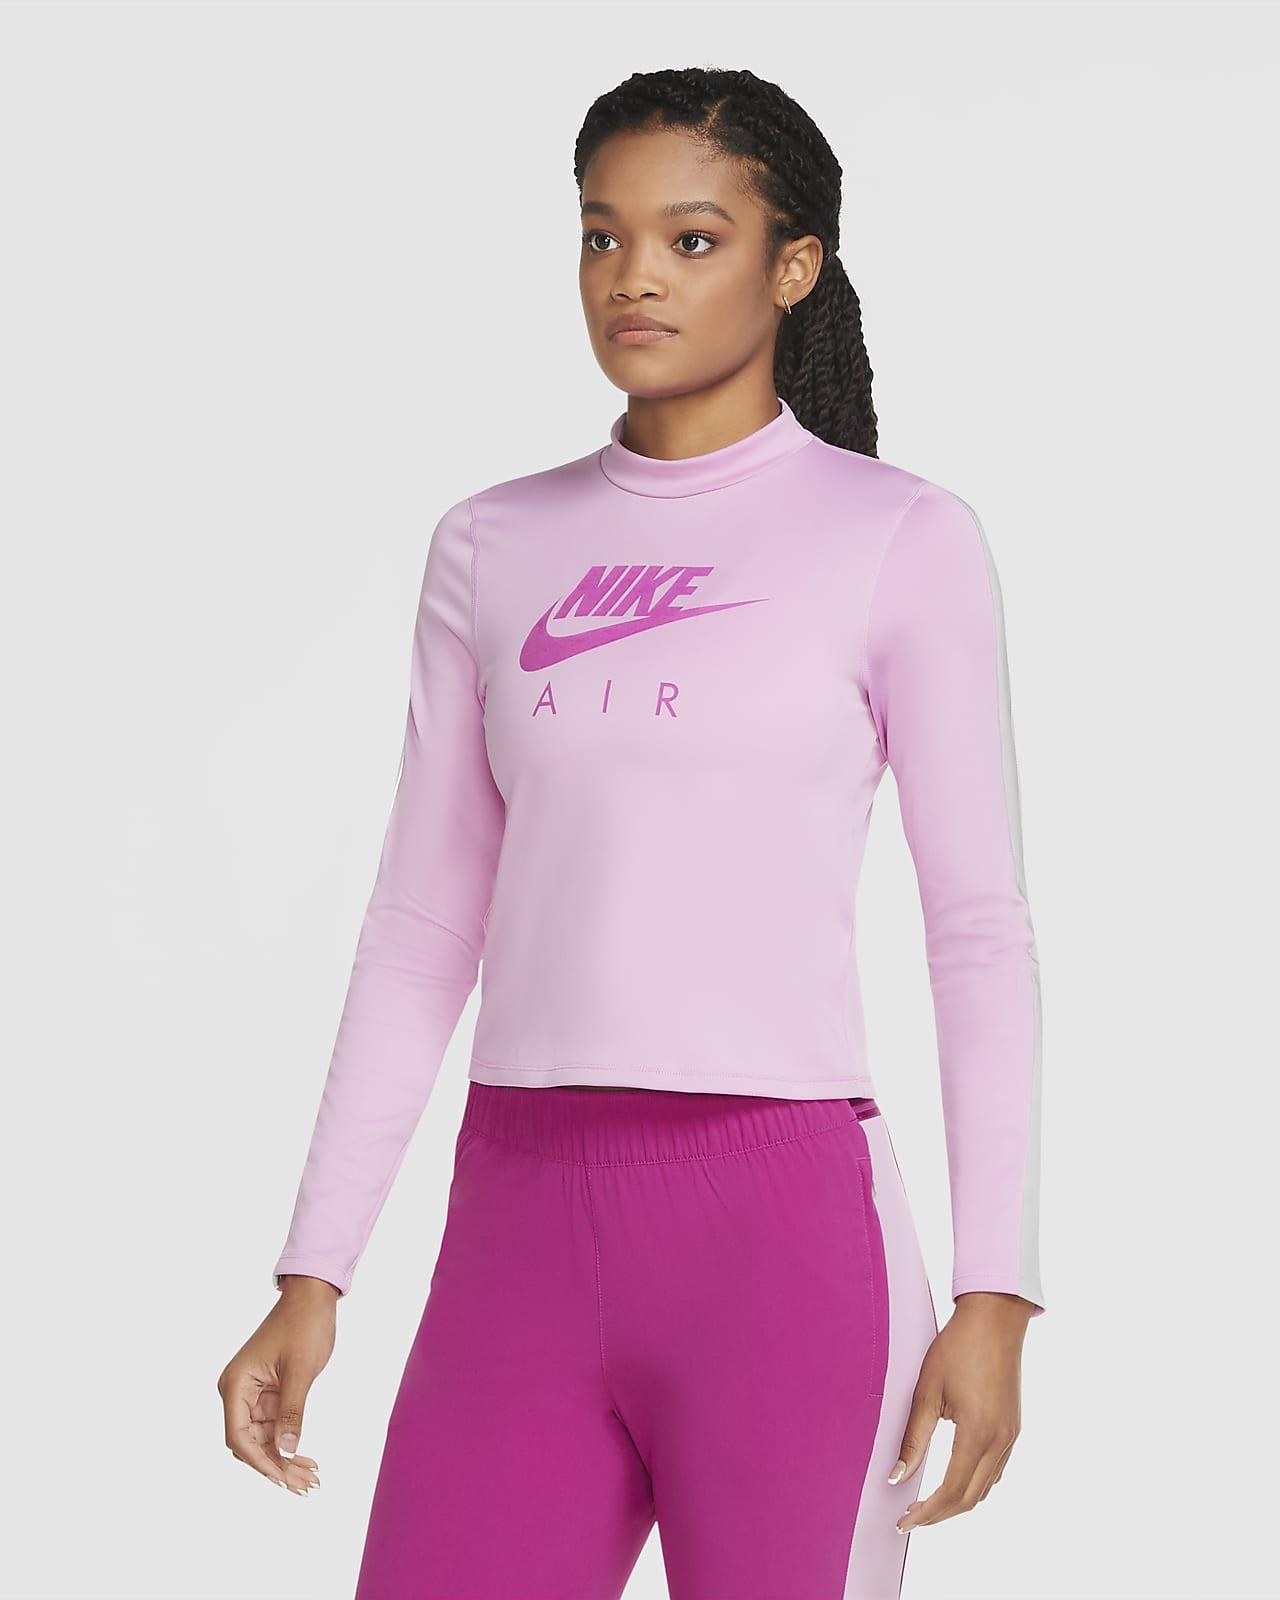 Prenda para la parte superior tipo capa intermedia de running de manga larga para mujer Nike Air